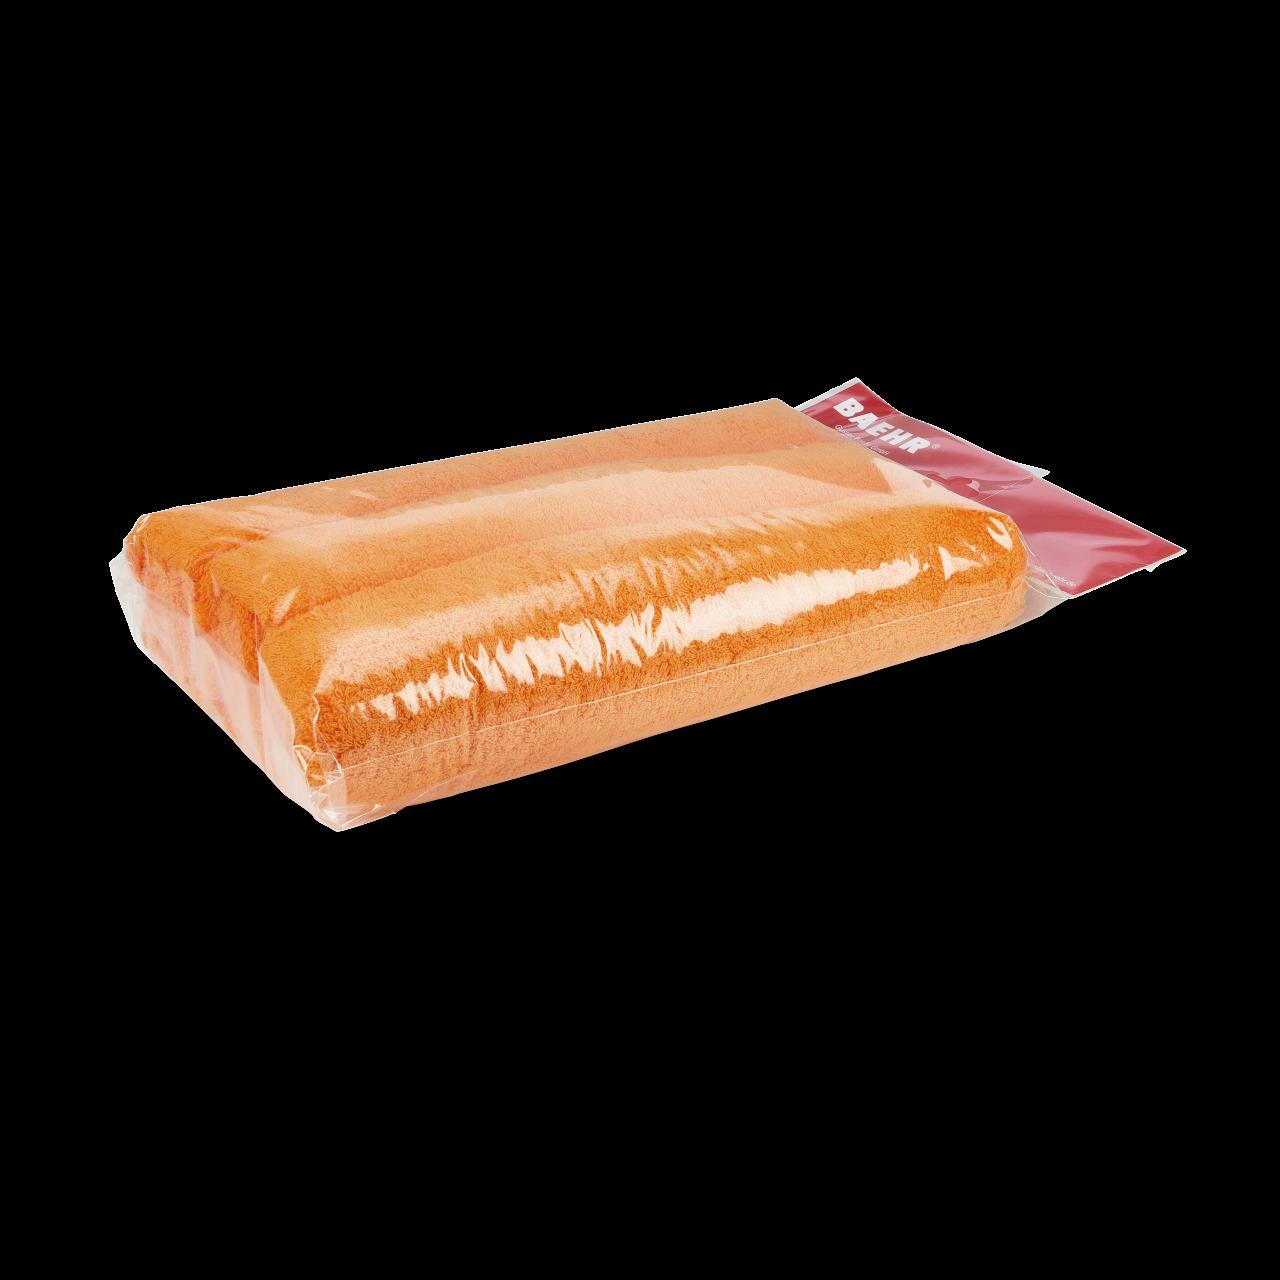 Handtuch Standard, apricot 90 x 40cm, 3 Stk.